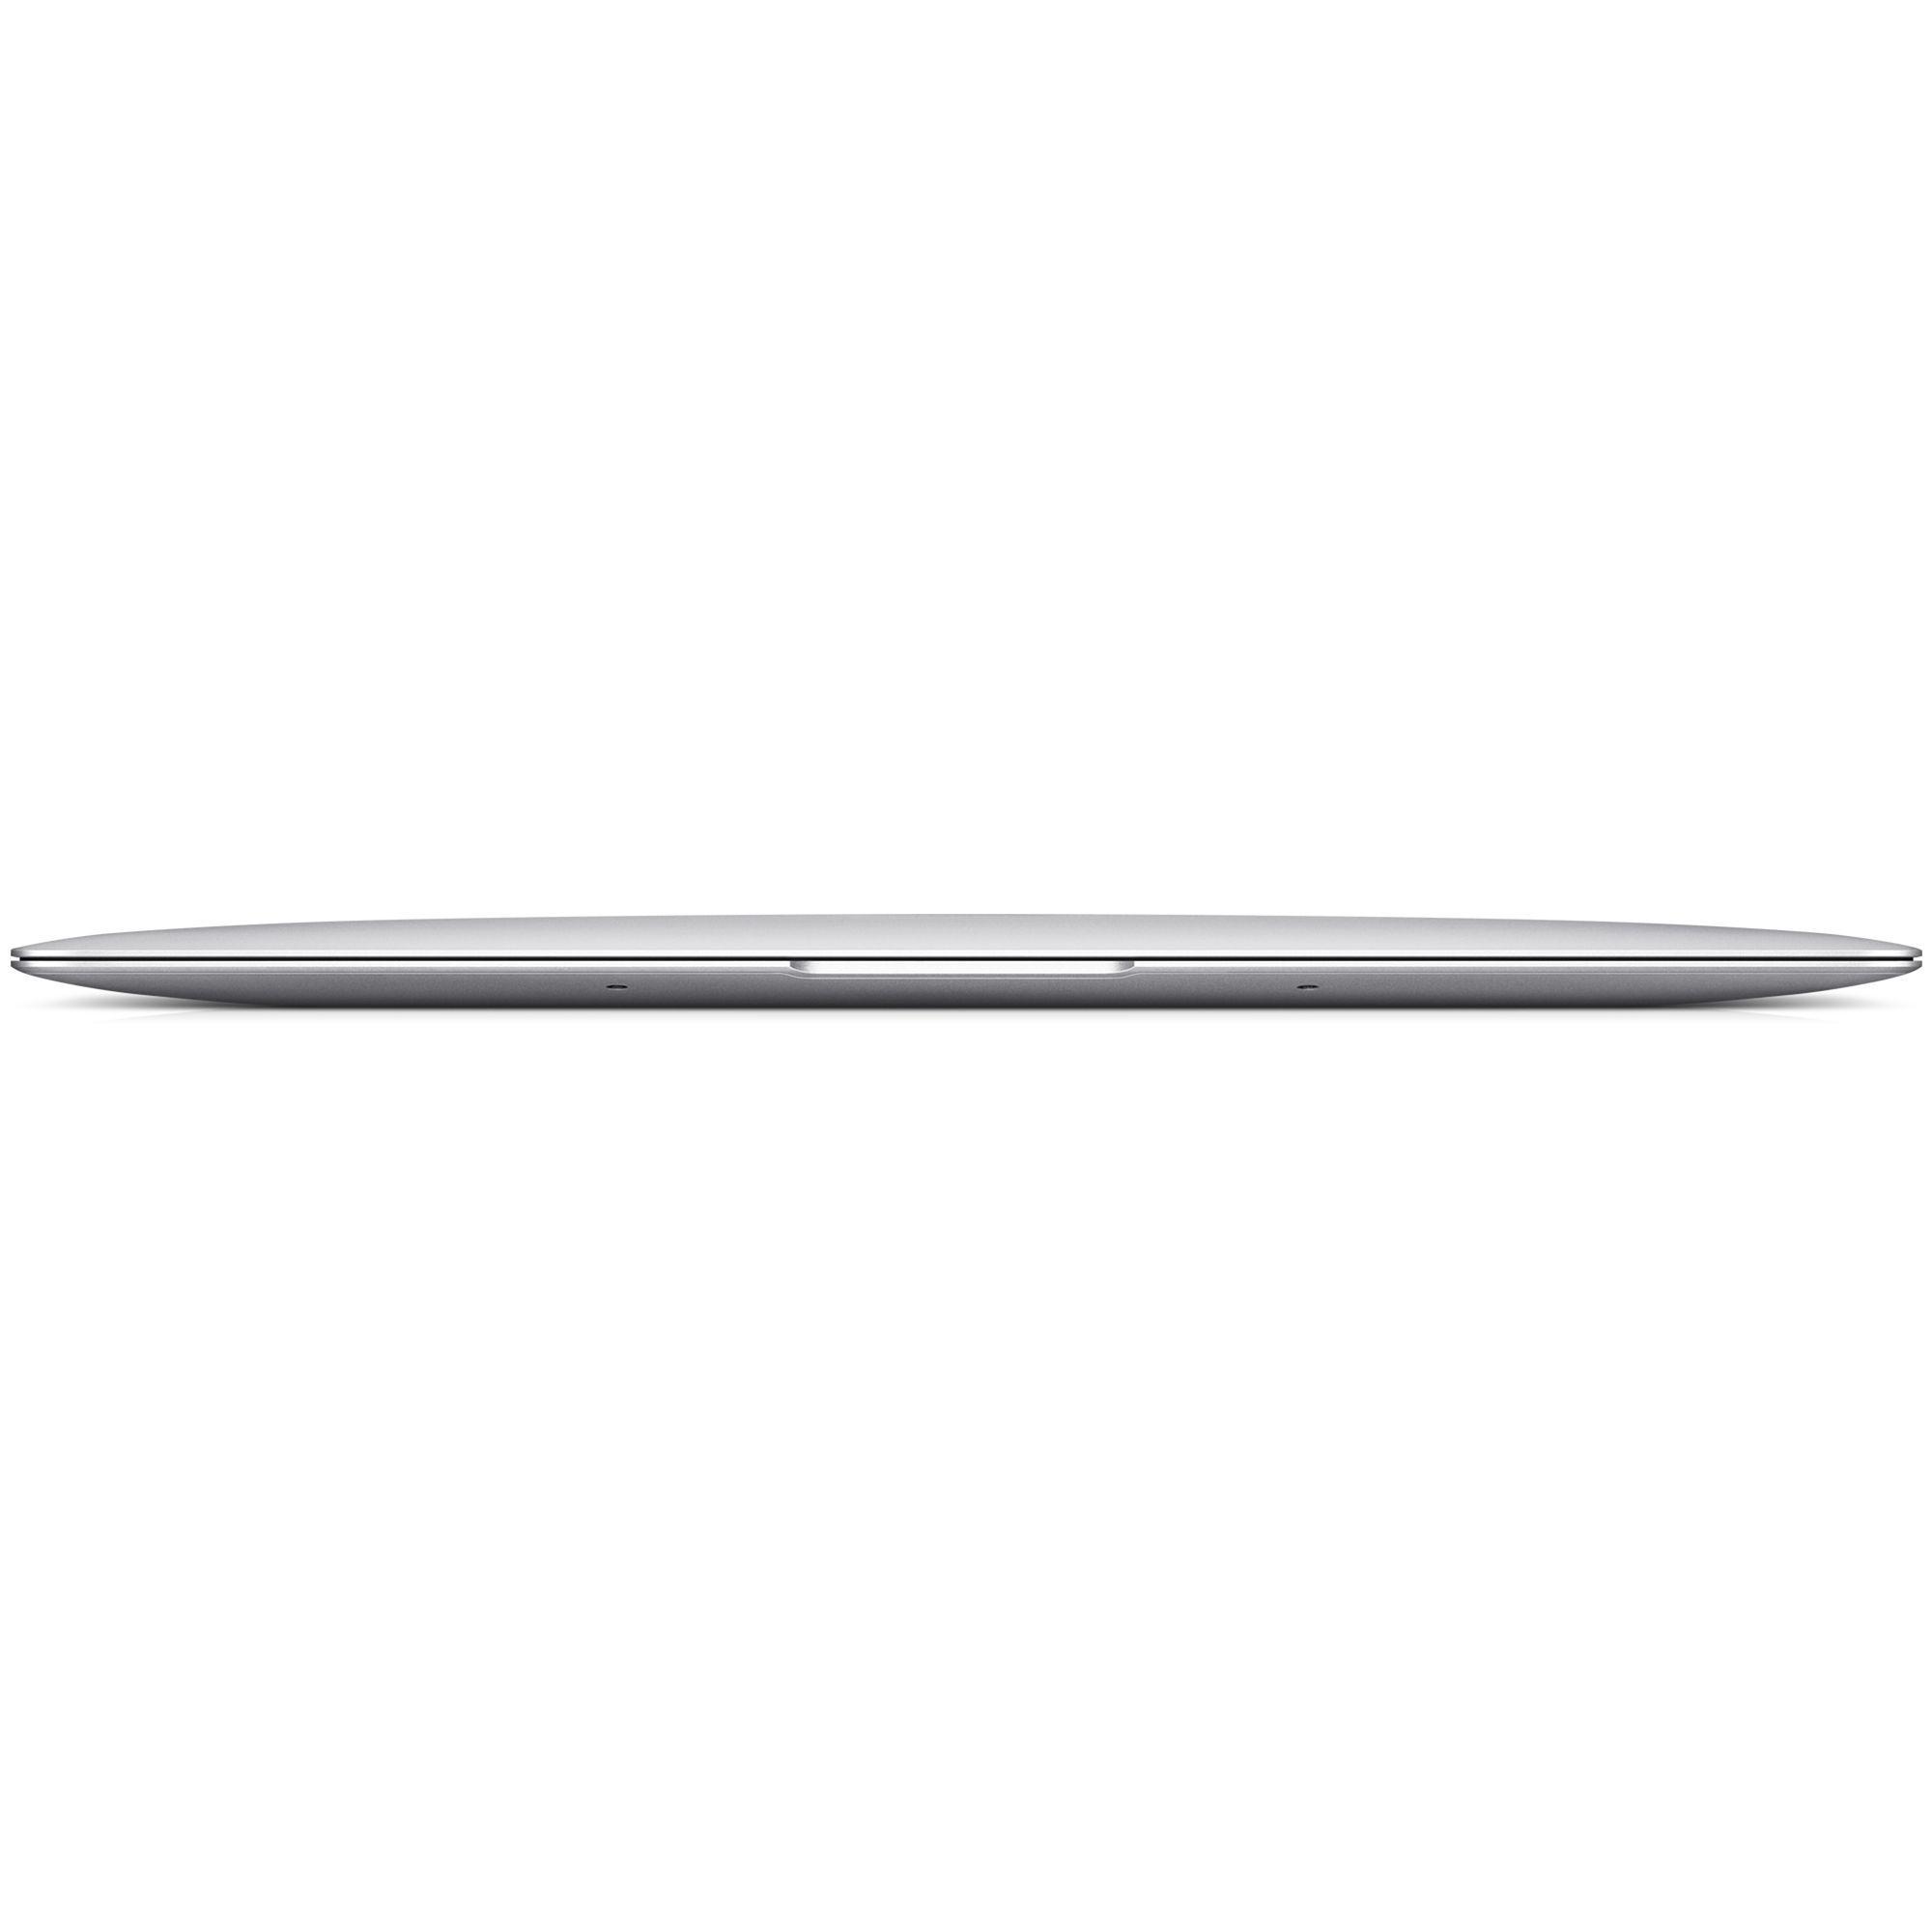 "Macbook Air 11"" Core i7 1,7 GHz - SSD 128 Go - RAM 4 Go"